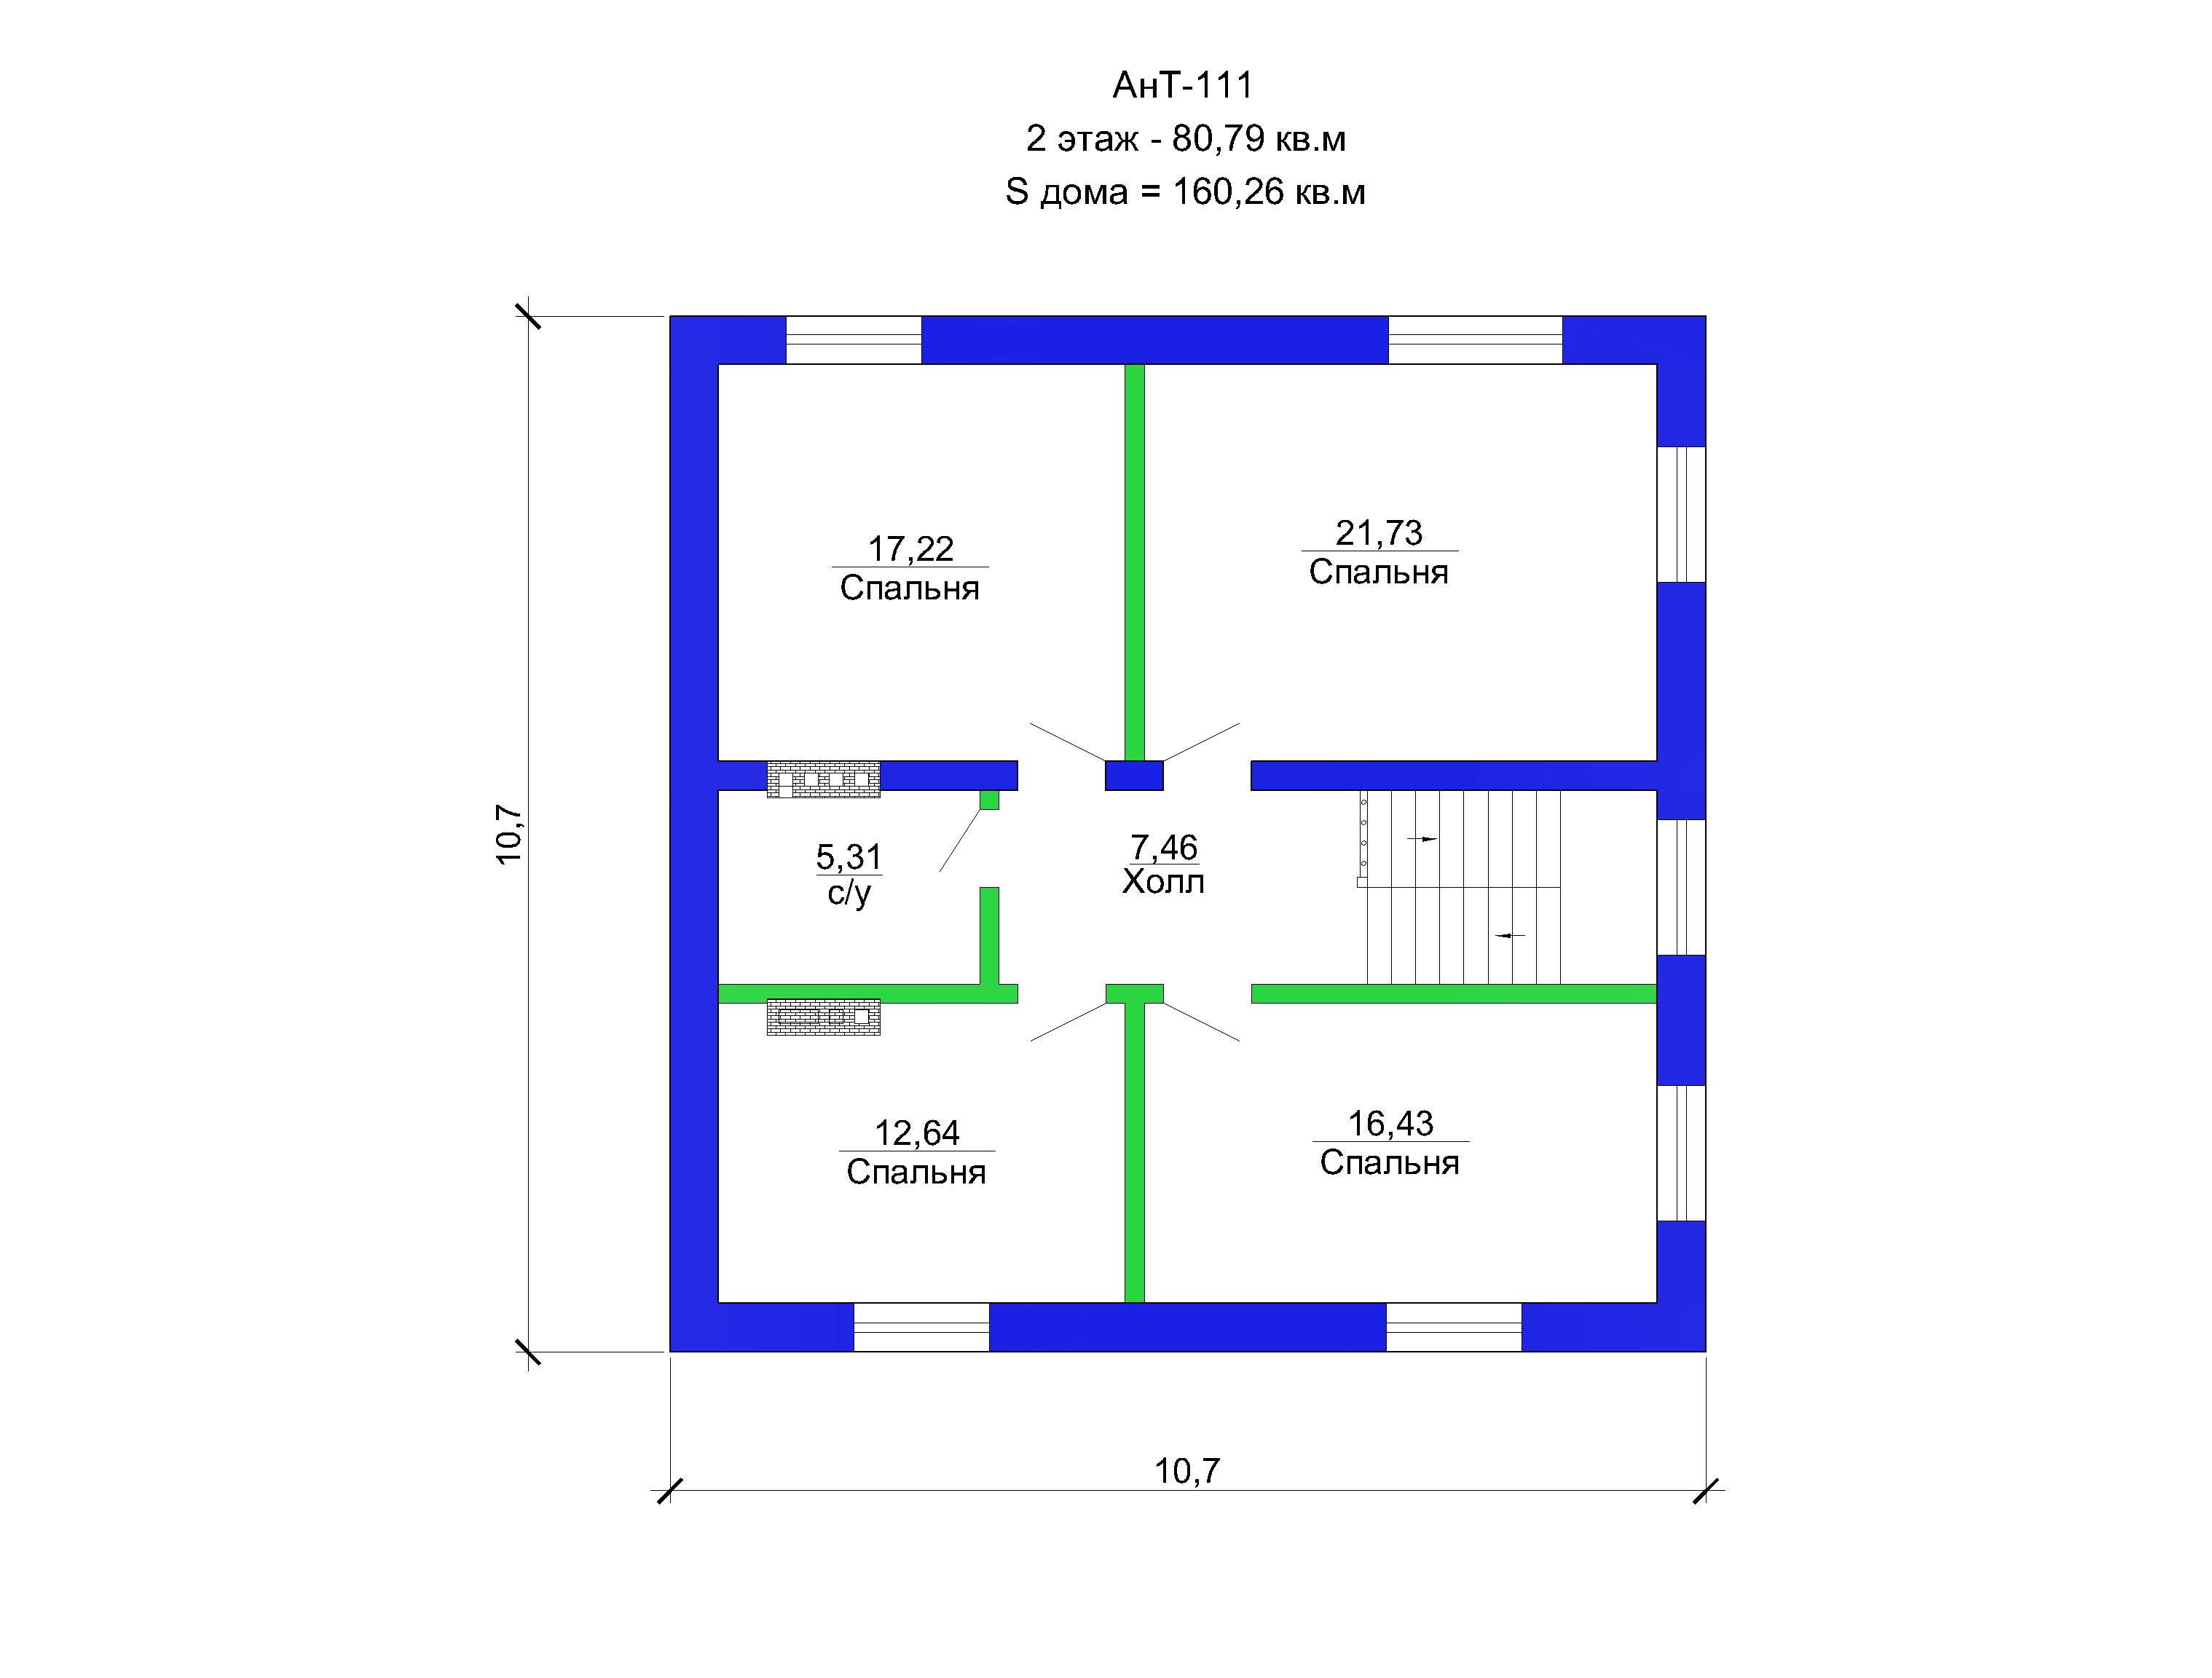 4 Готовый проект дома 160 кв.м / Артикул AHT-111 план